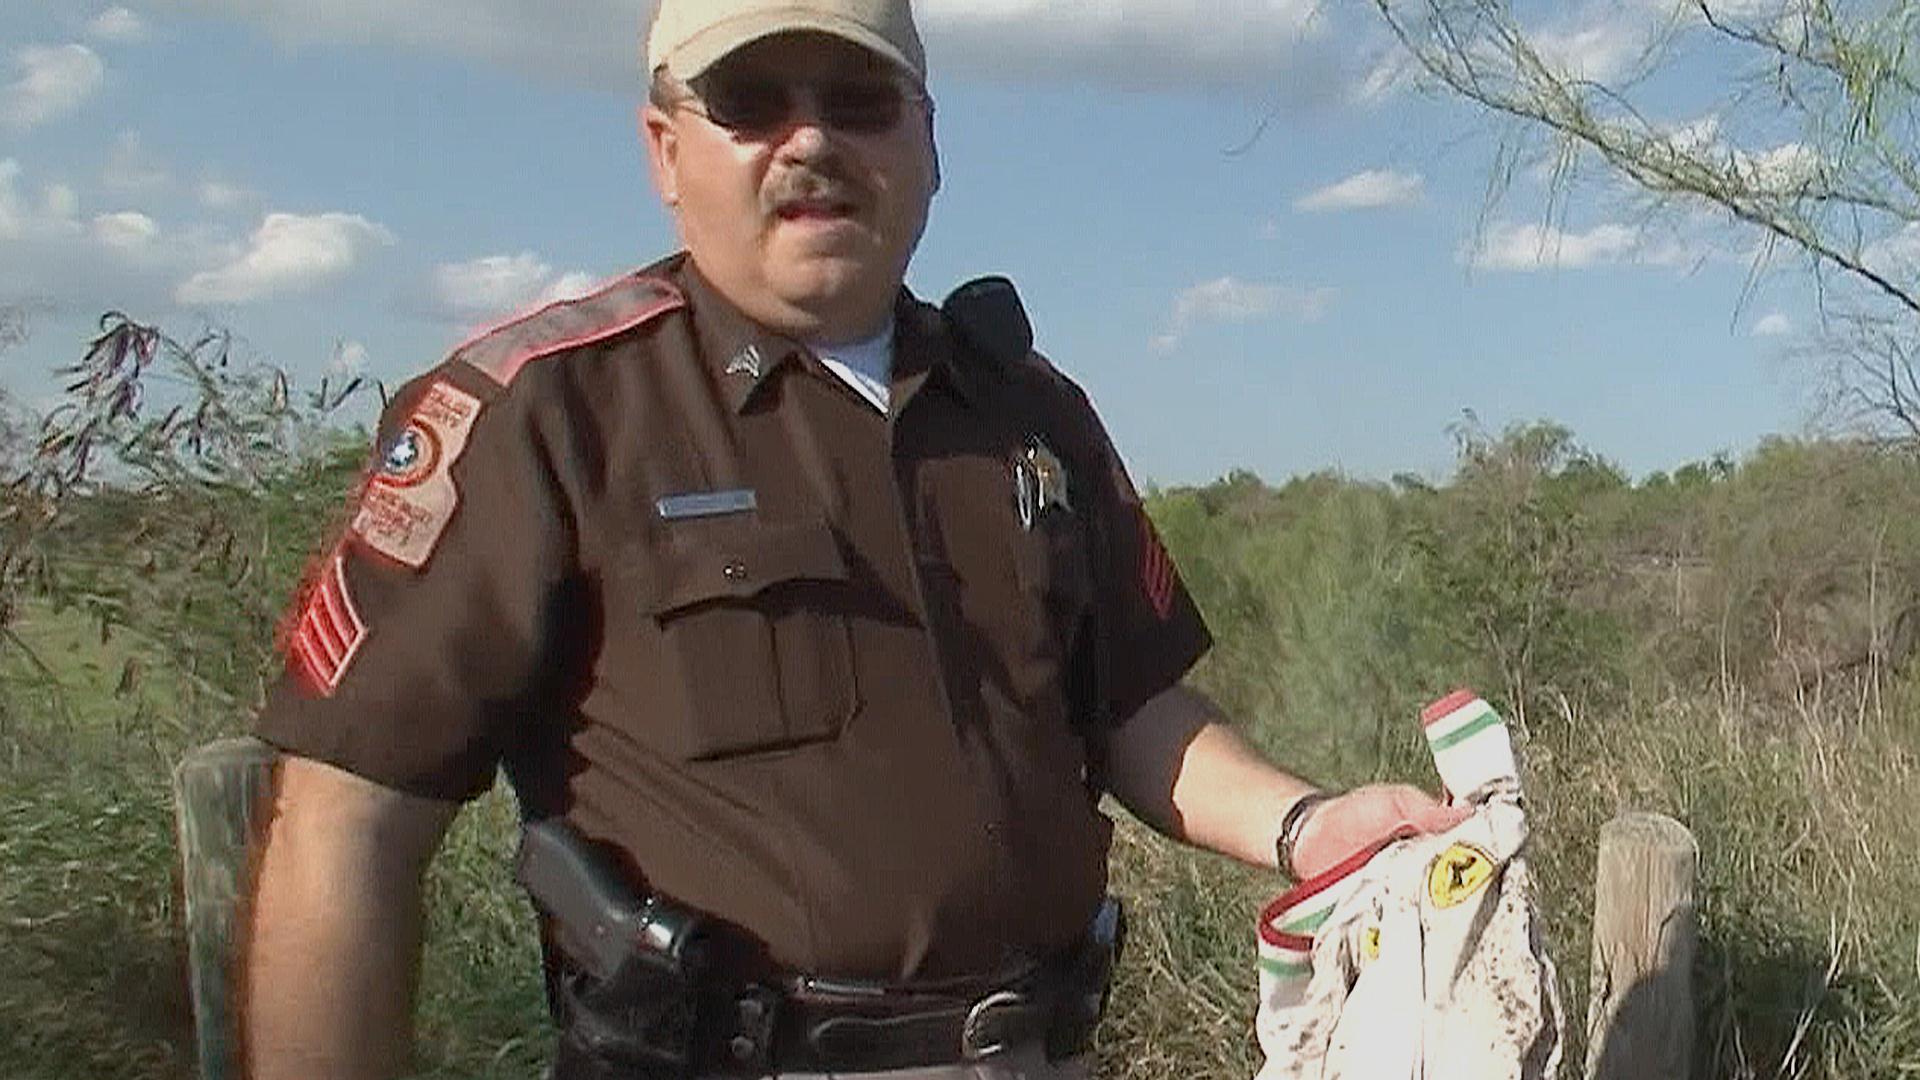 Image: Texas Sergeant